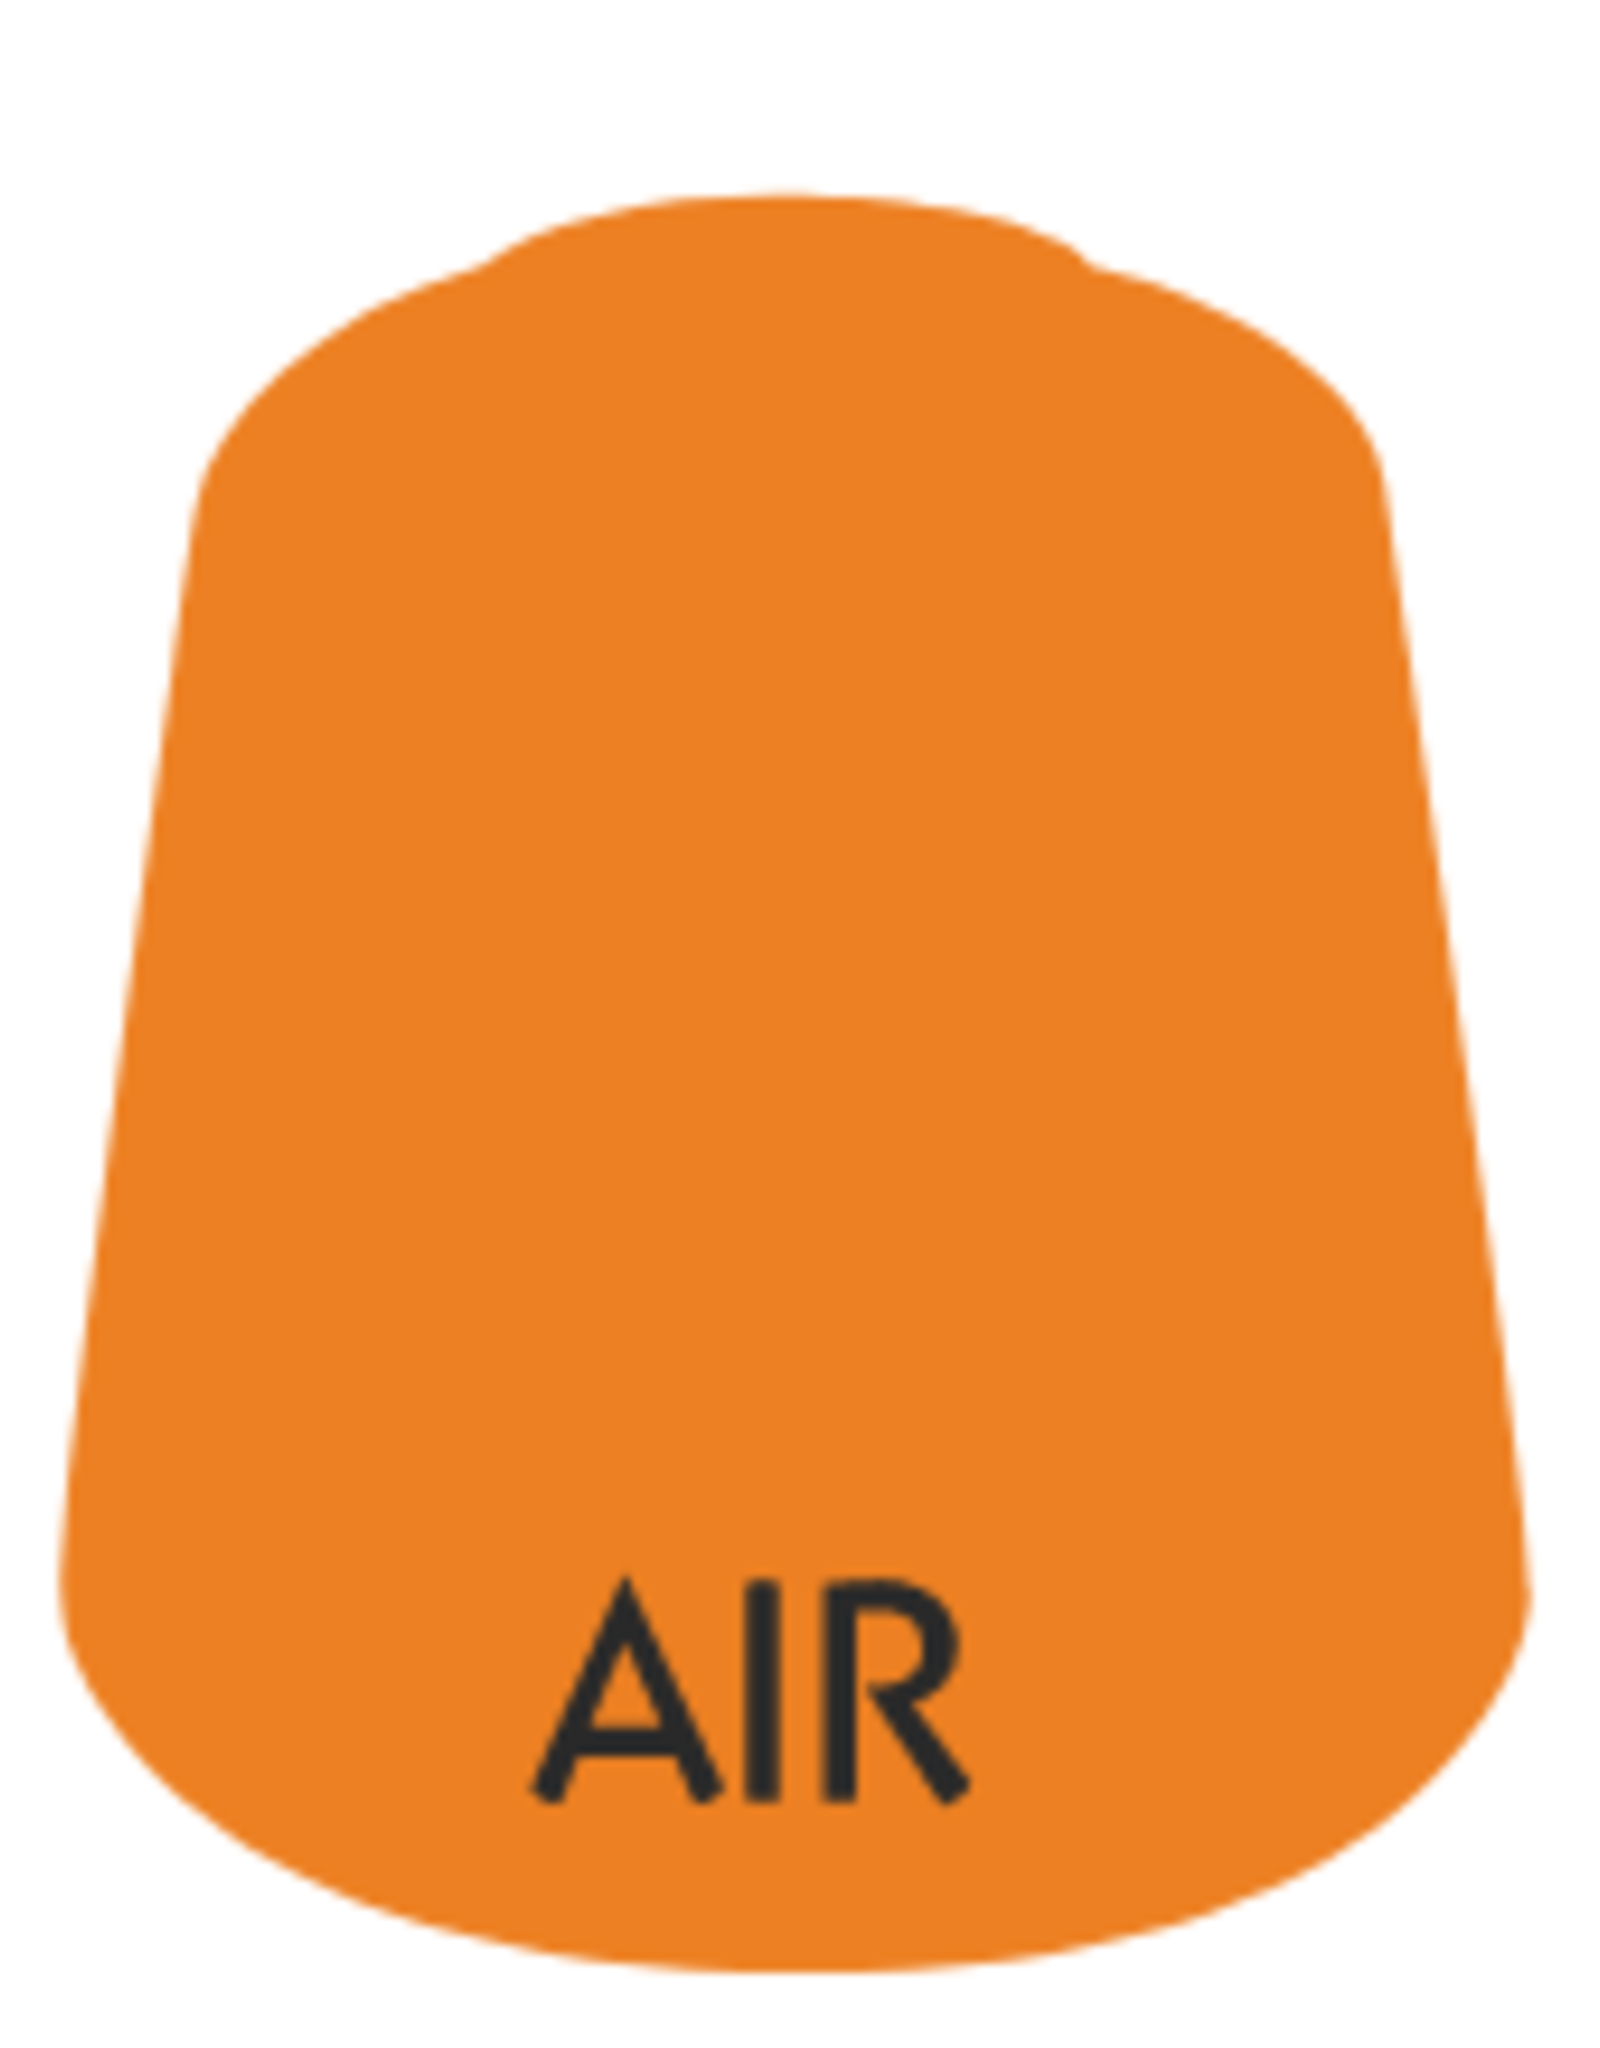 Games Workshop Air: Pyroclast  Orange Clear (24ml) Paint